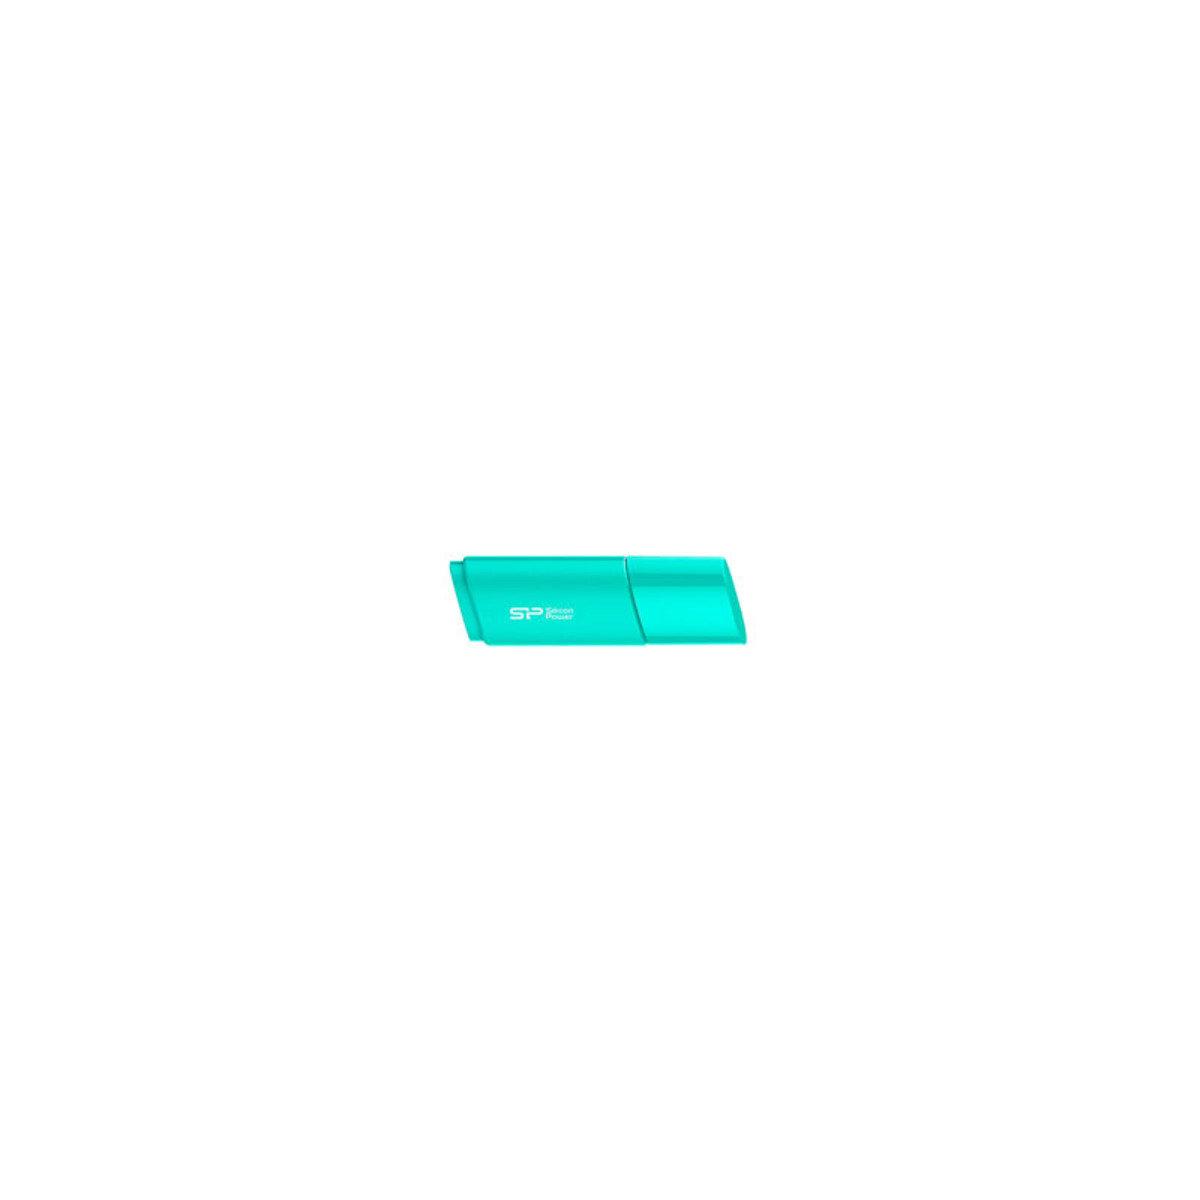 USB2.0快閃記憶棒 Ultima U06 64GB 湖水藍